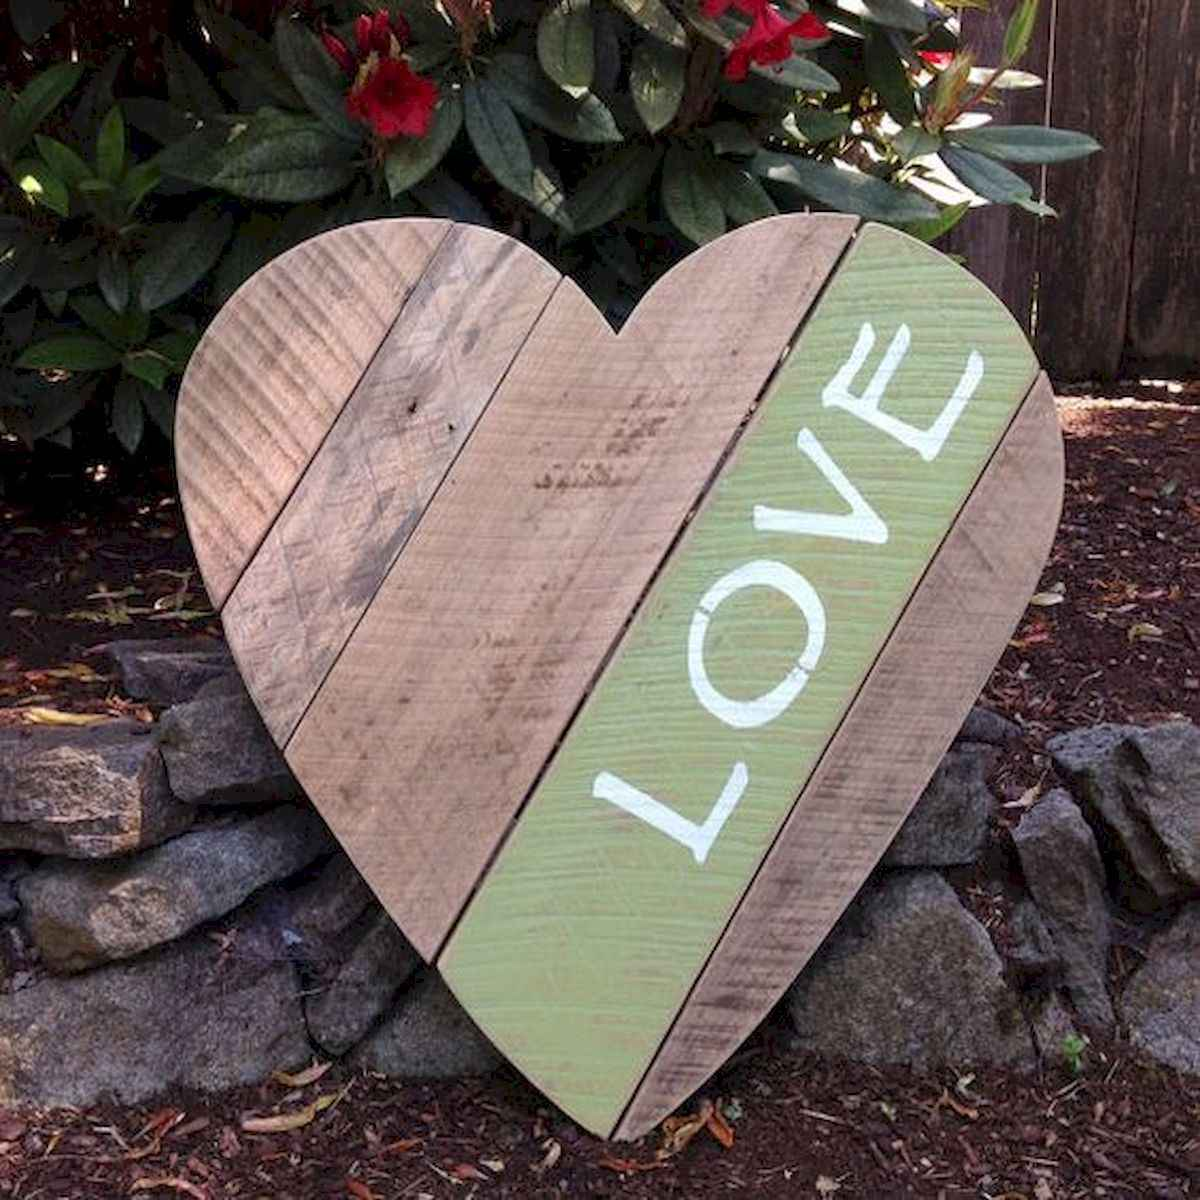 75 lovely valentines day crafts design ideas (50)